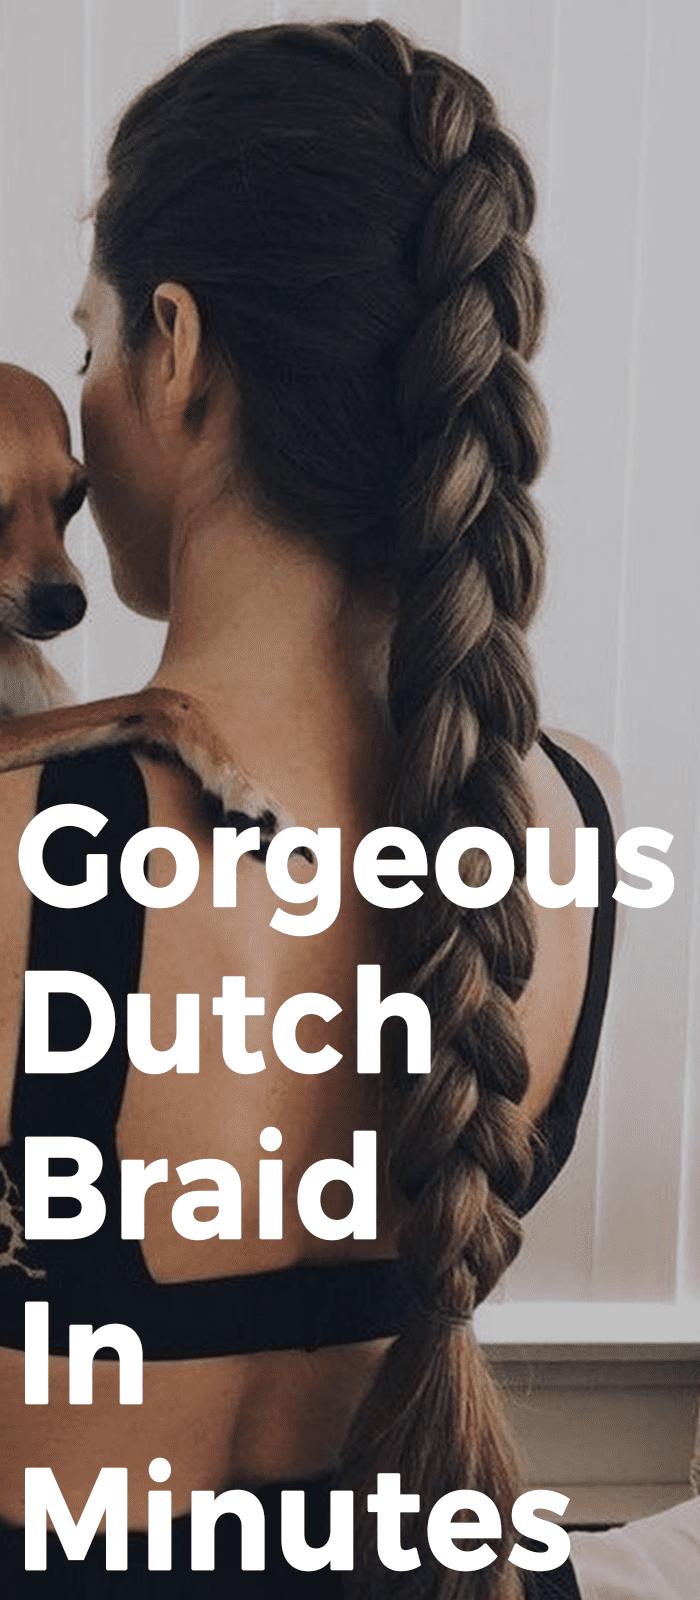 Gorgeous Dutch Braid Hairstyle In Minutes